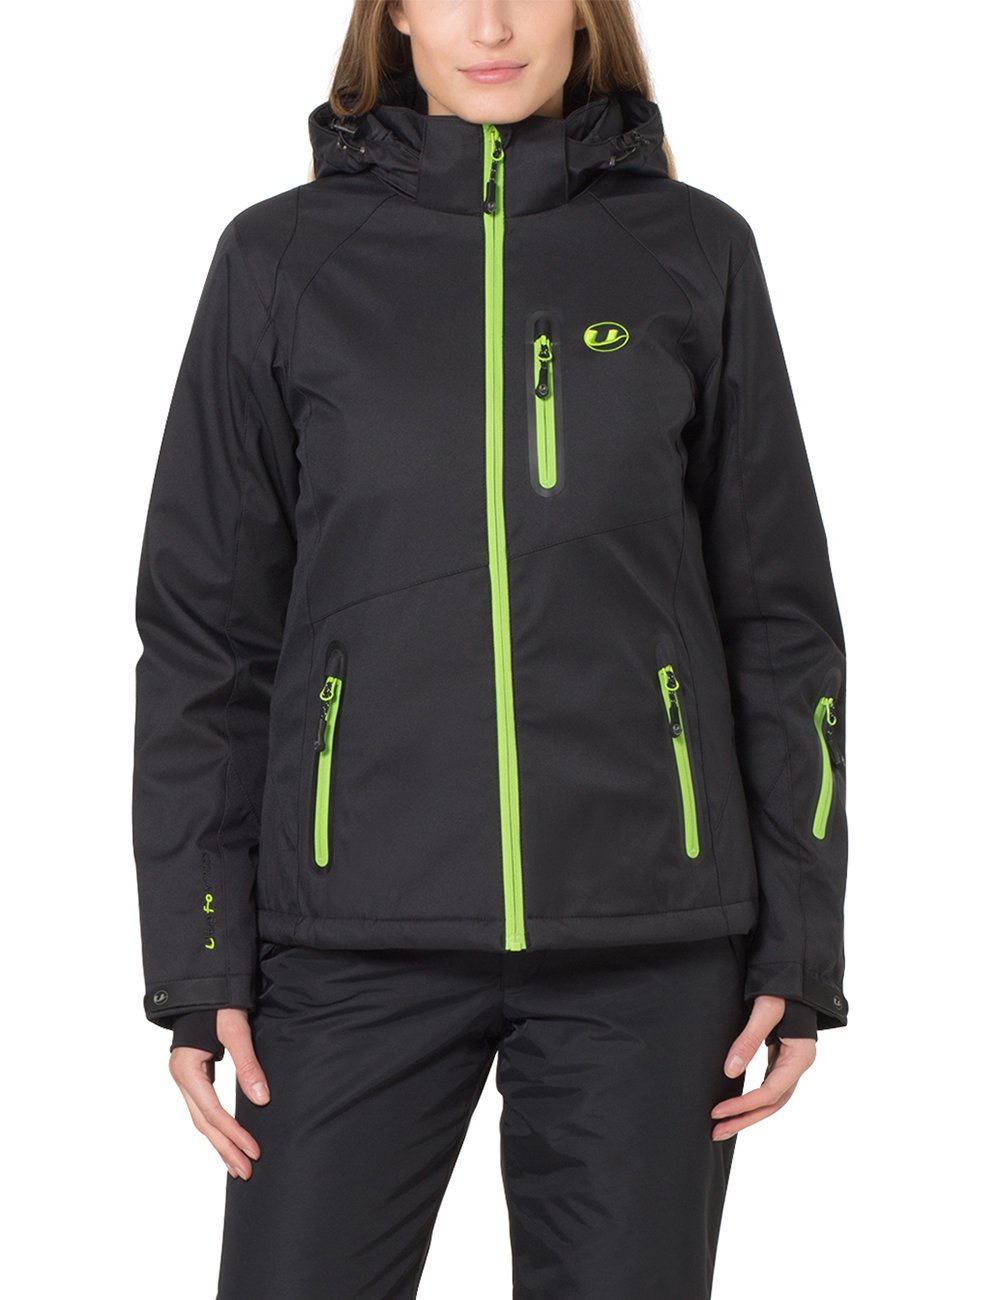 Ultrasport Damen Funktions Alpin Outdoorjacke Softshell Serfaus Jacke, Black/App